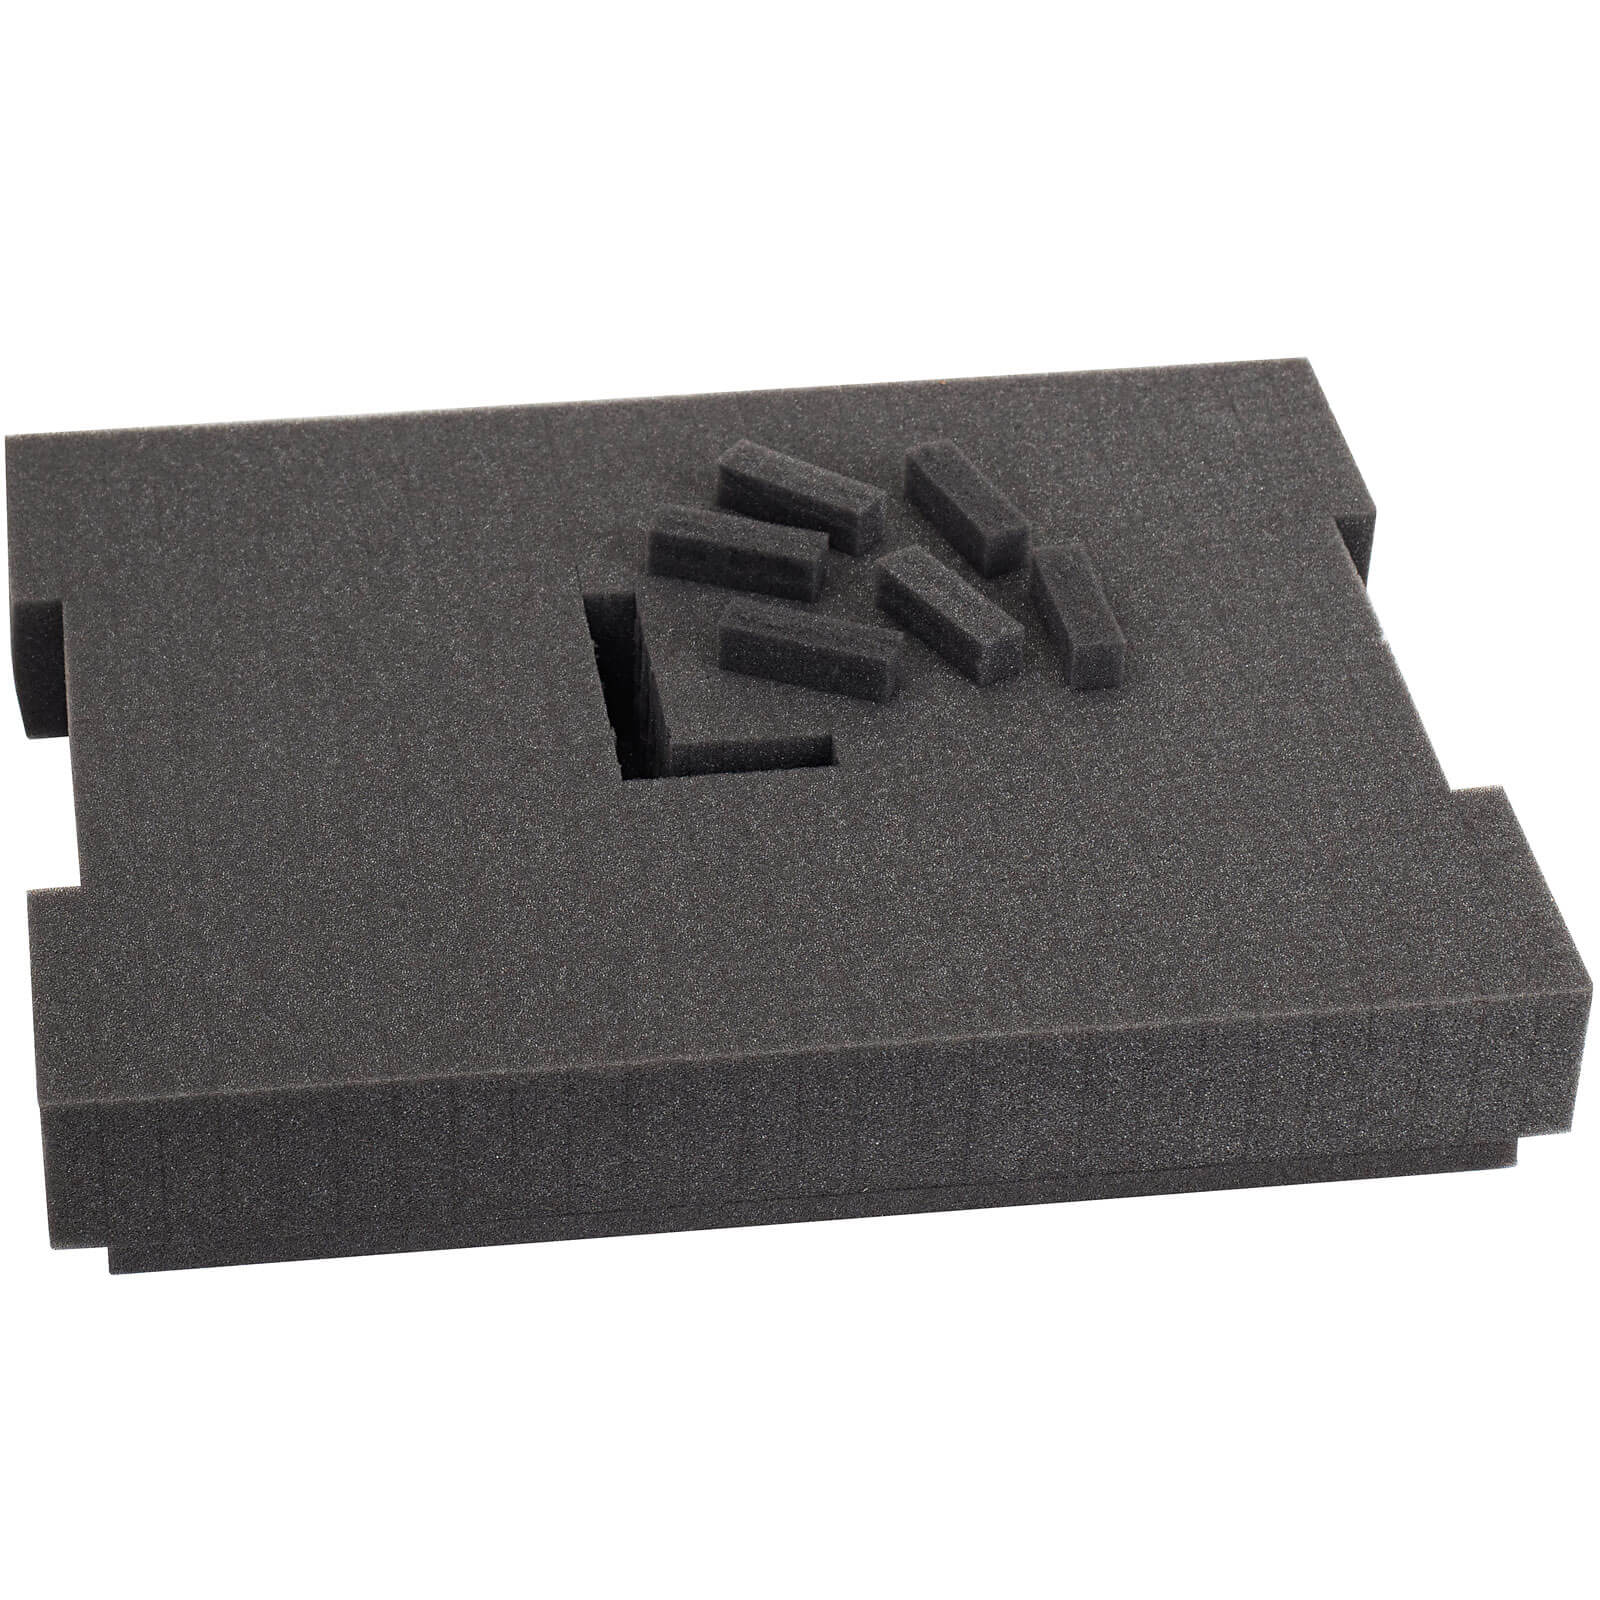 Image of Bosch 102 L-Boxx Foam Insert